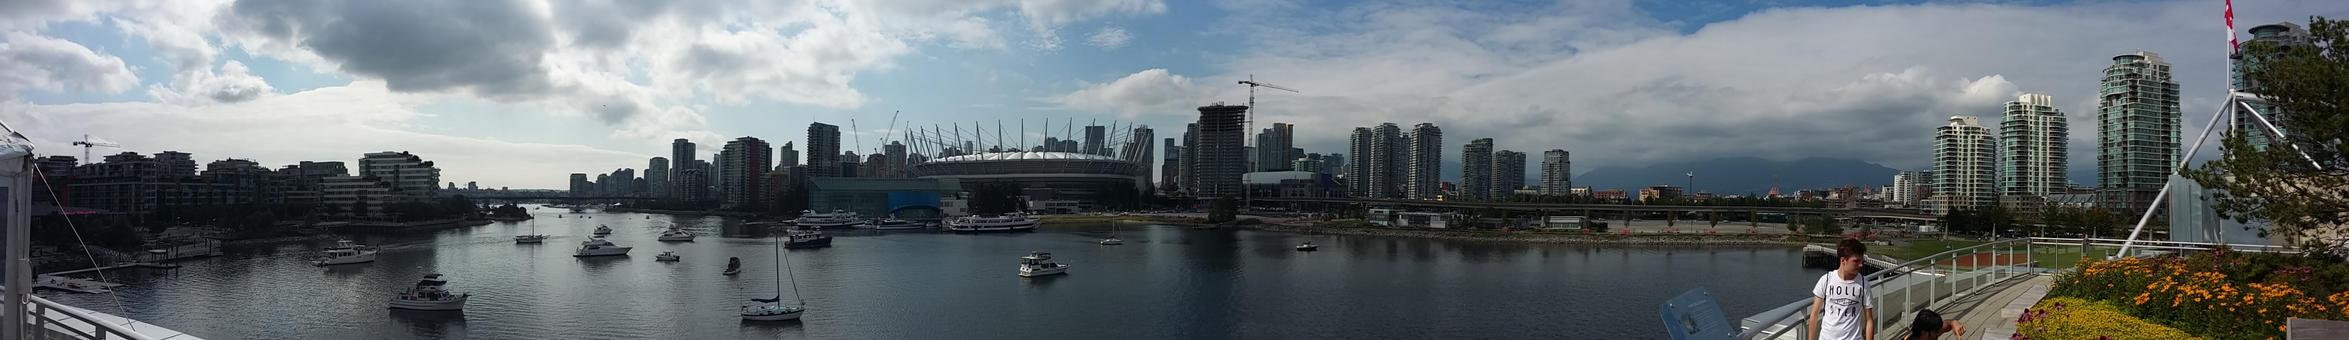 Vancouver panorama Shot by HeitorSatlerMacedo